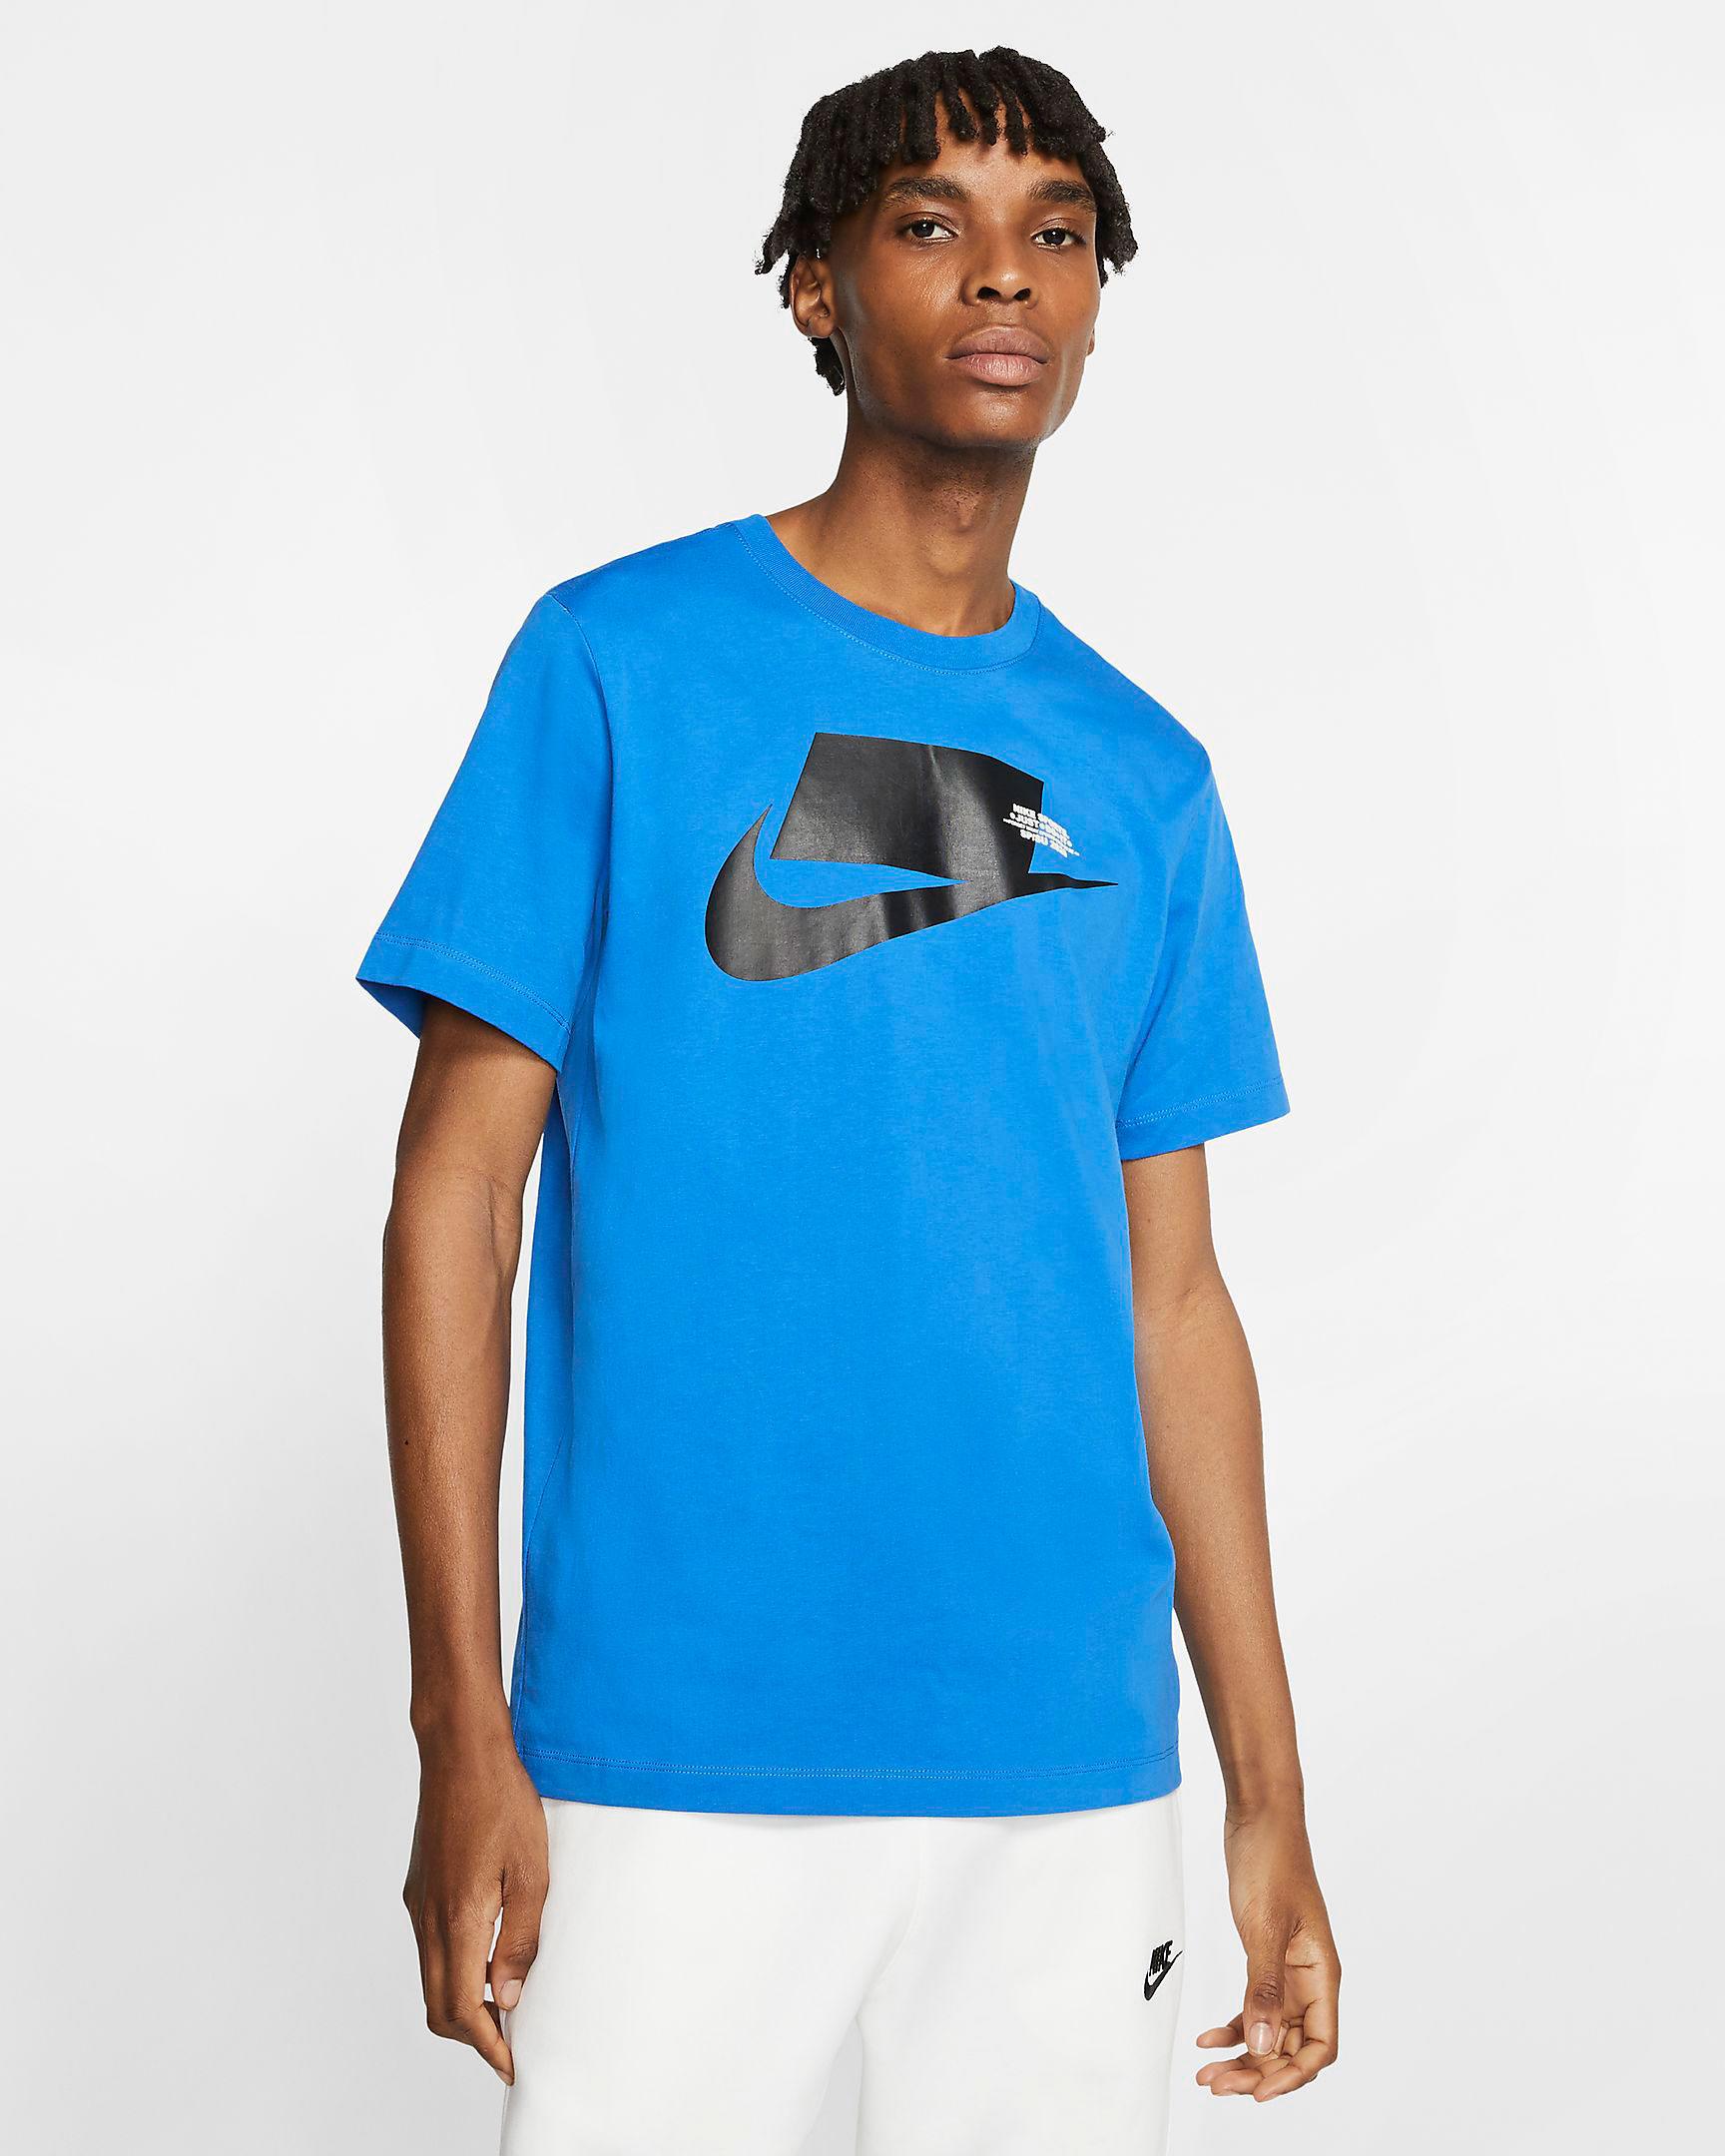 nike-sportswear-block-logo-shirt-blue